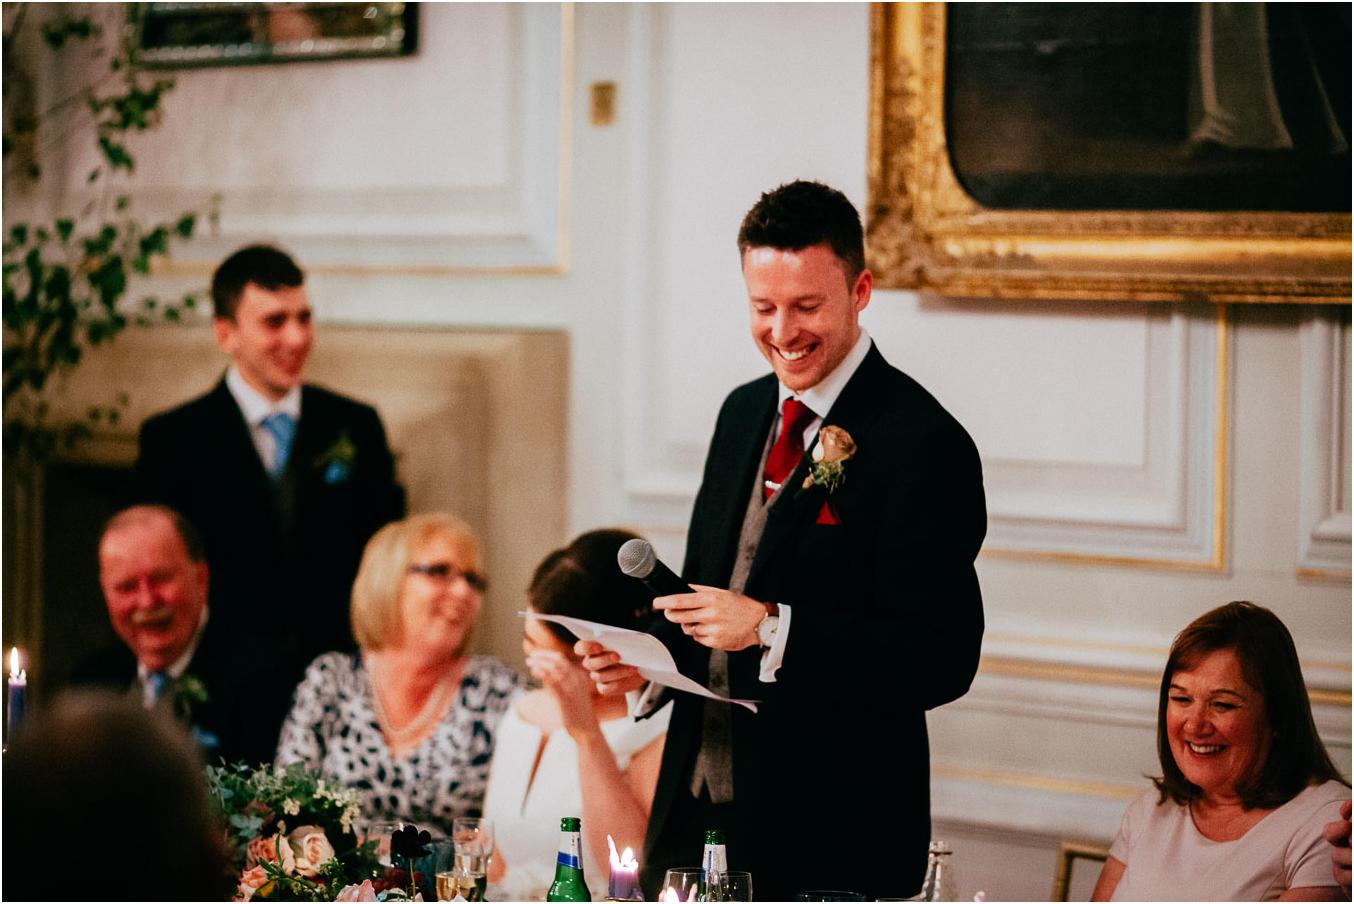 Hassop_Hall_Wedding_Photographs-114.jpg